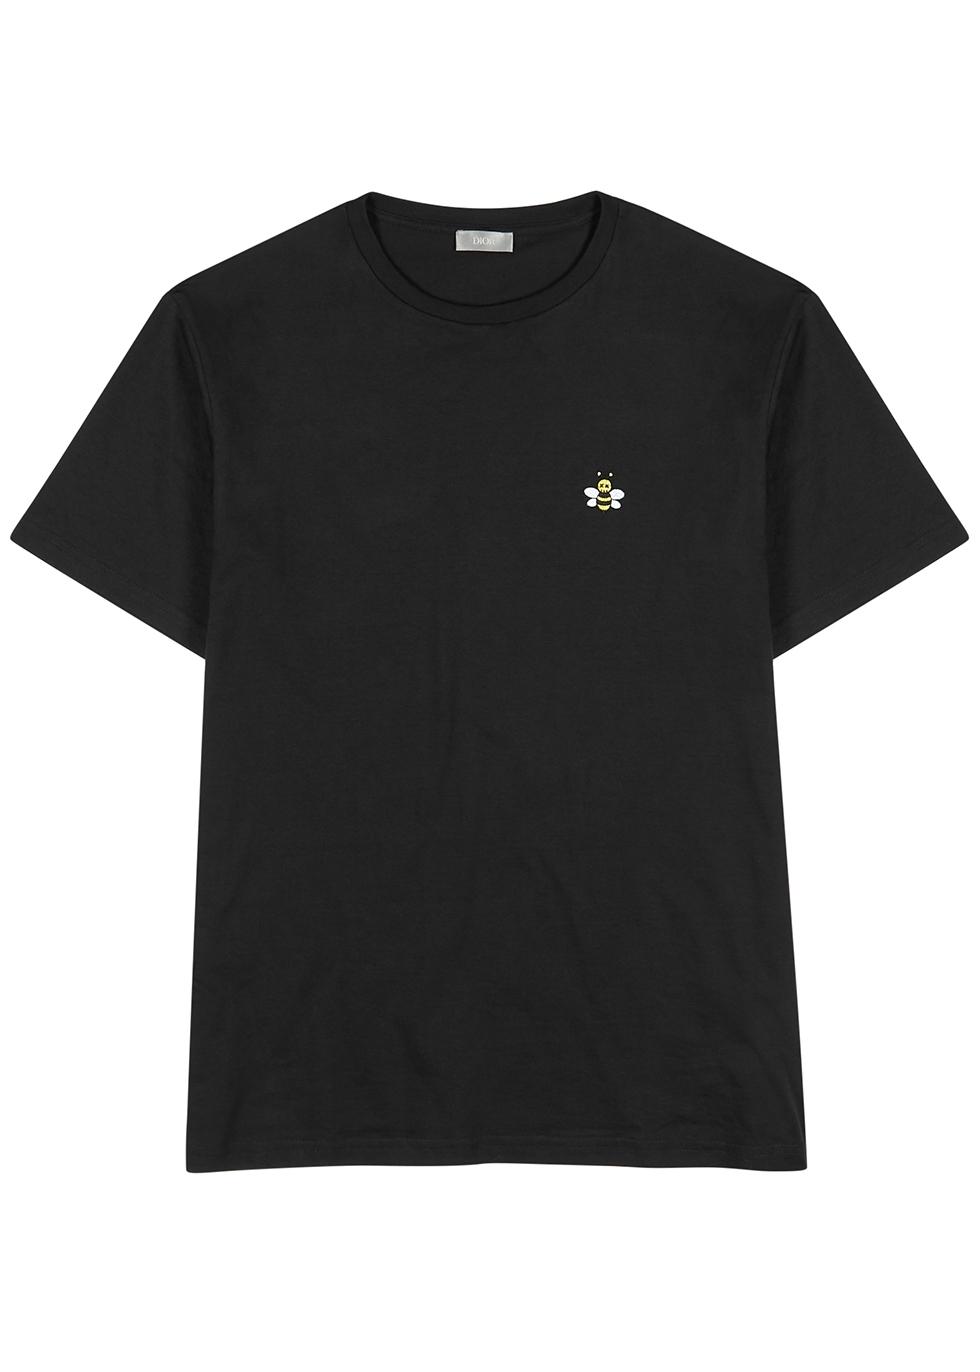 bb0b6c07 Dior Homme T-Shirts, Polo Shirts, Jackets, Scarves - Harvey Nichols